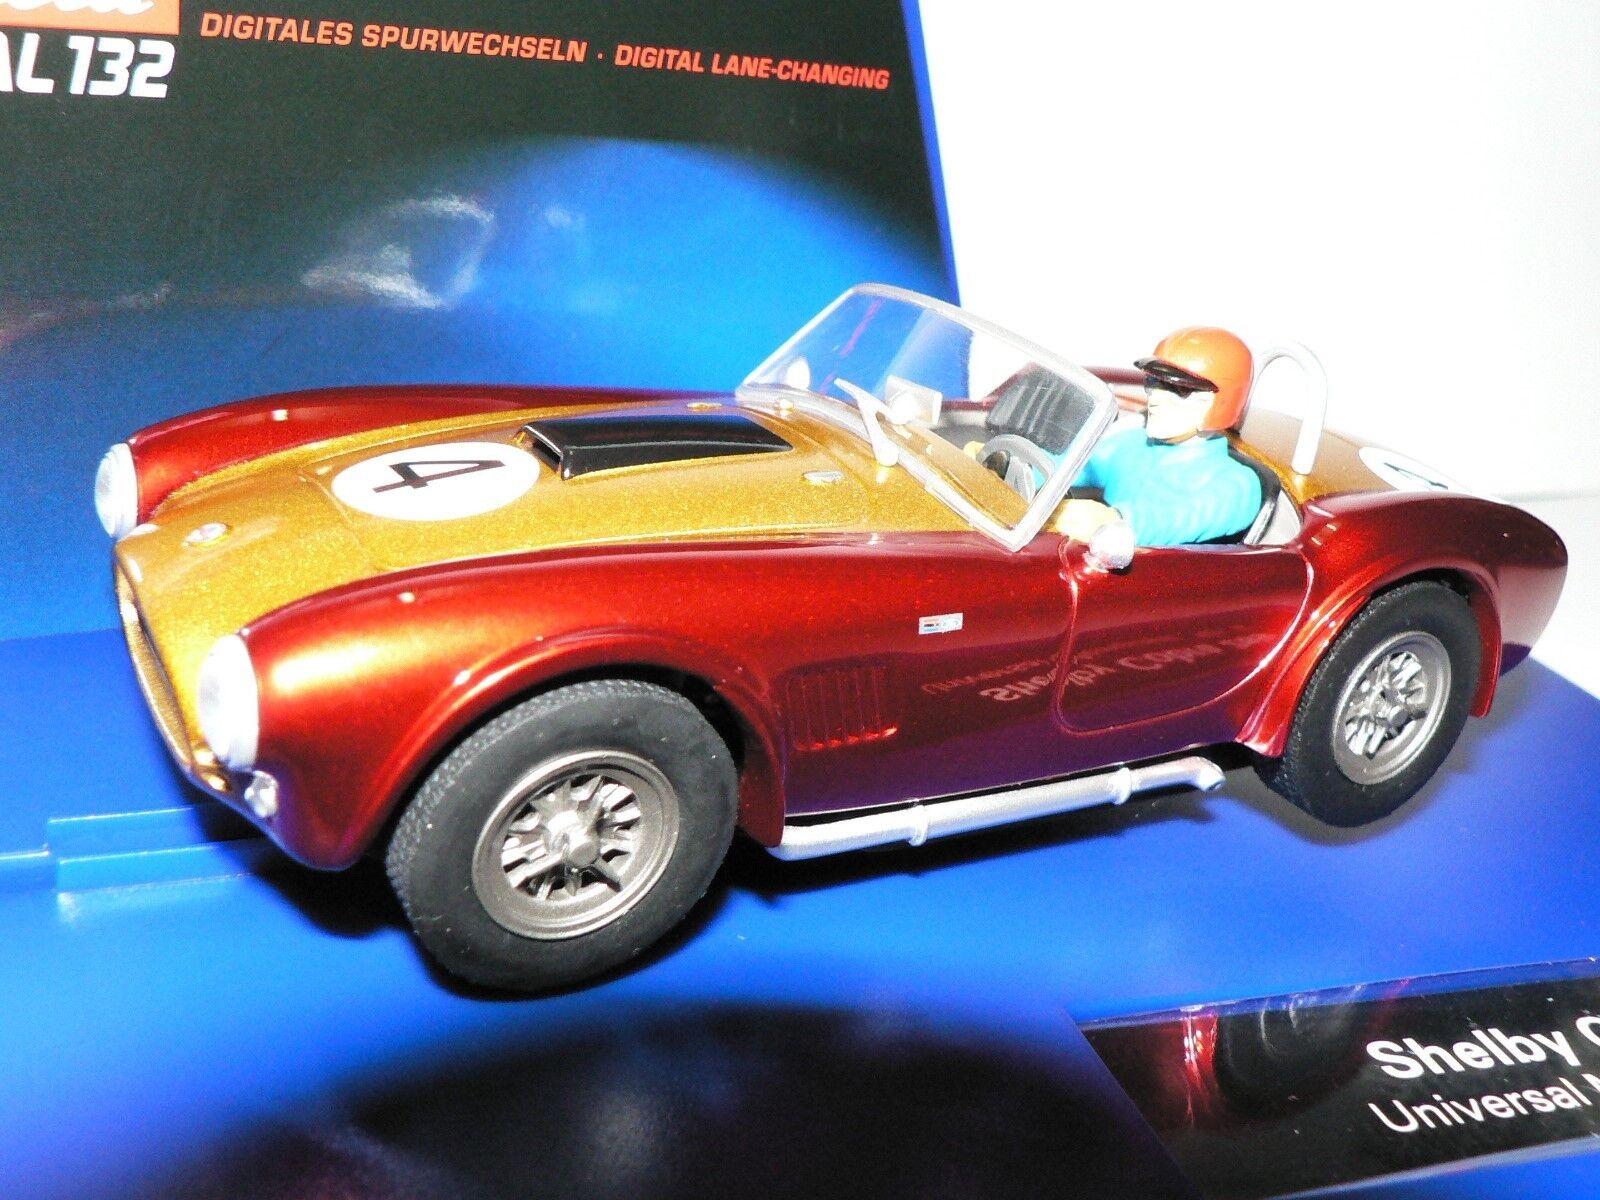 Carrera Digital 132 30650 Shelby Cobra 289 Universale Memories No.4 Nuovo